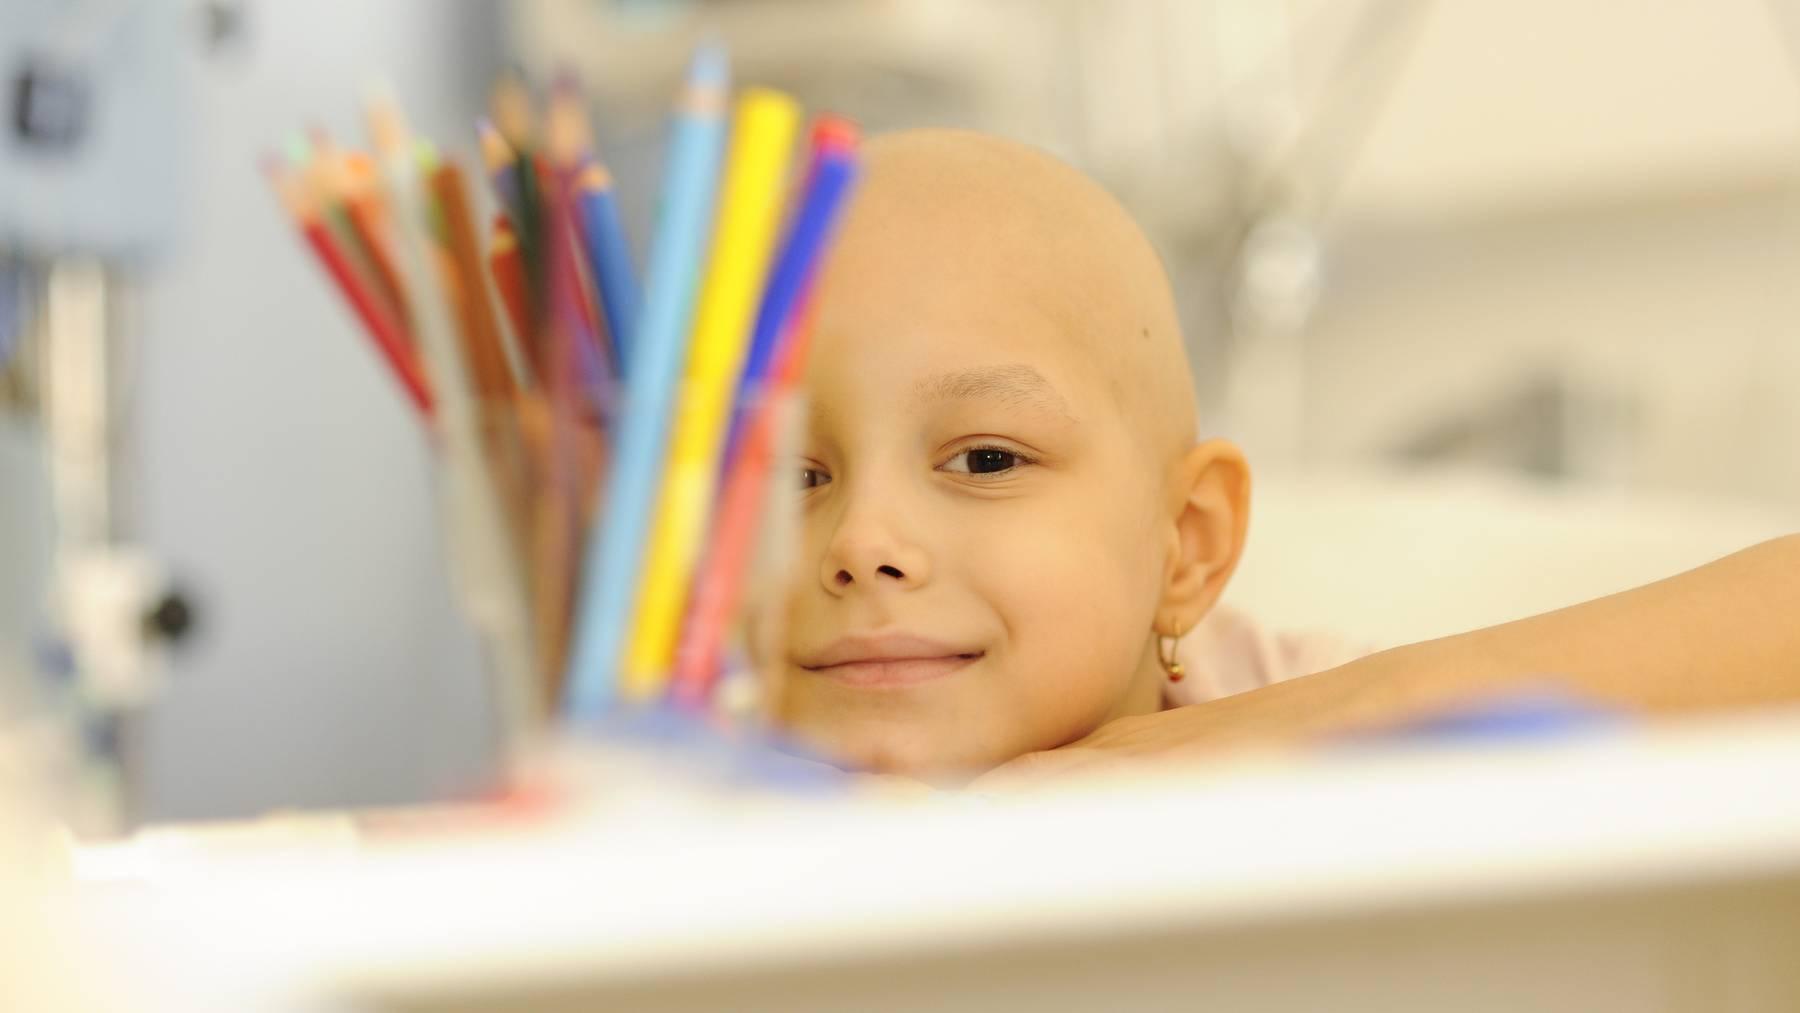 Fotoarchiv Kinderspital-KISPI-FOTO-FOTO_ALLGEMEIN-20130327--FOTO_ALLGEMEIN--1.3.6.1.4.1.24930.8.250170-6